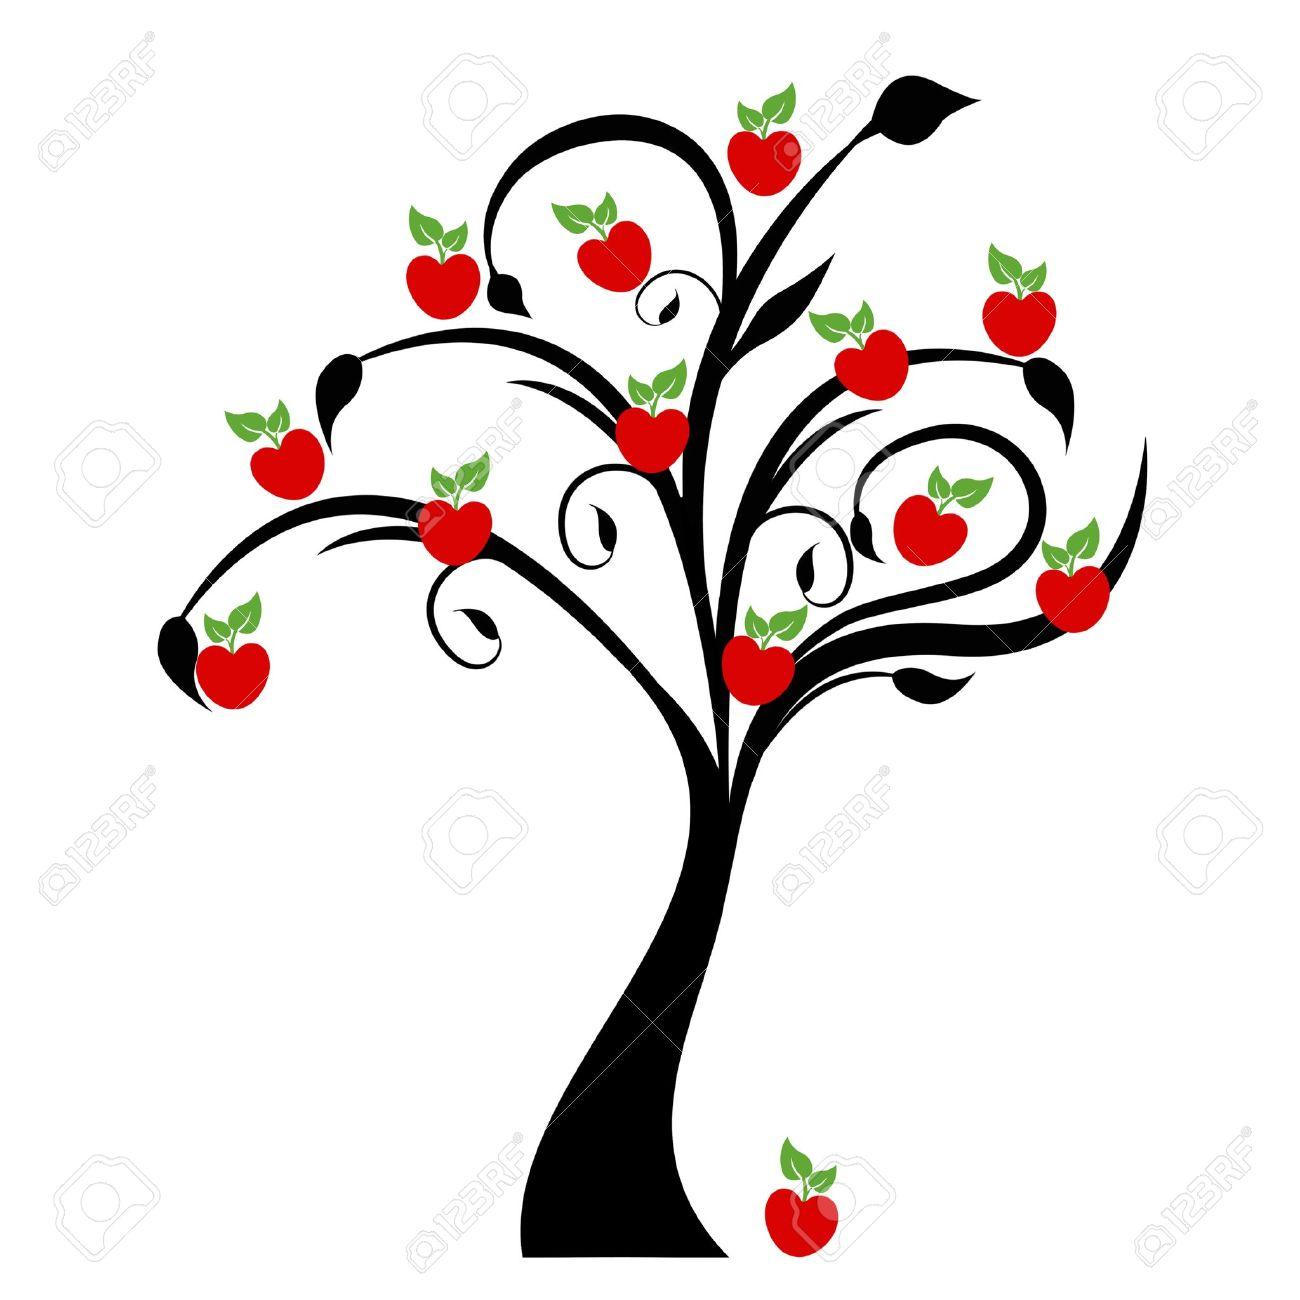 Beautiful apple tree isolated on white background - 13220167